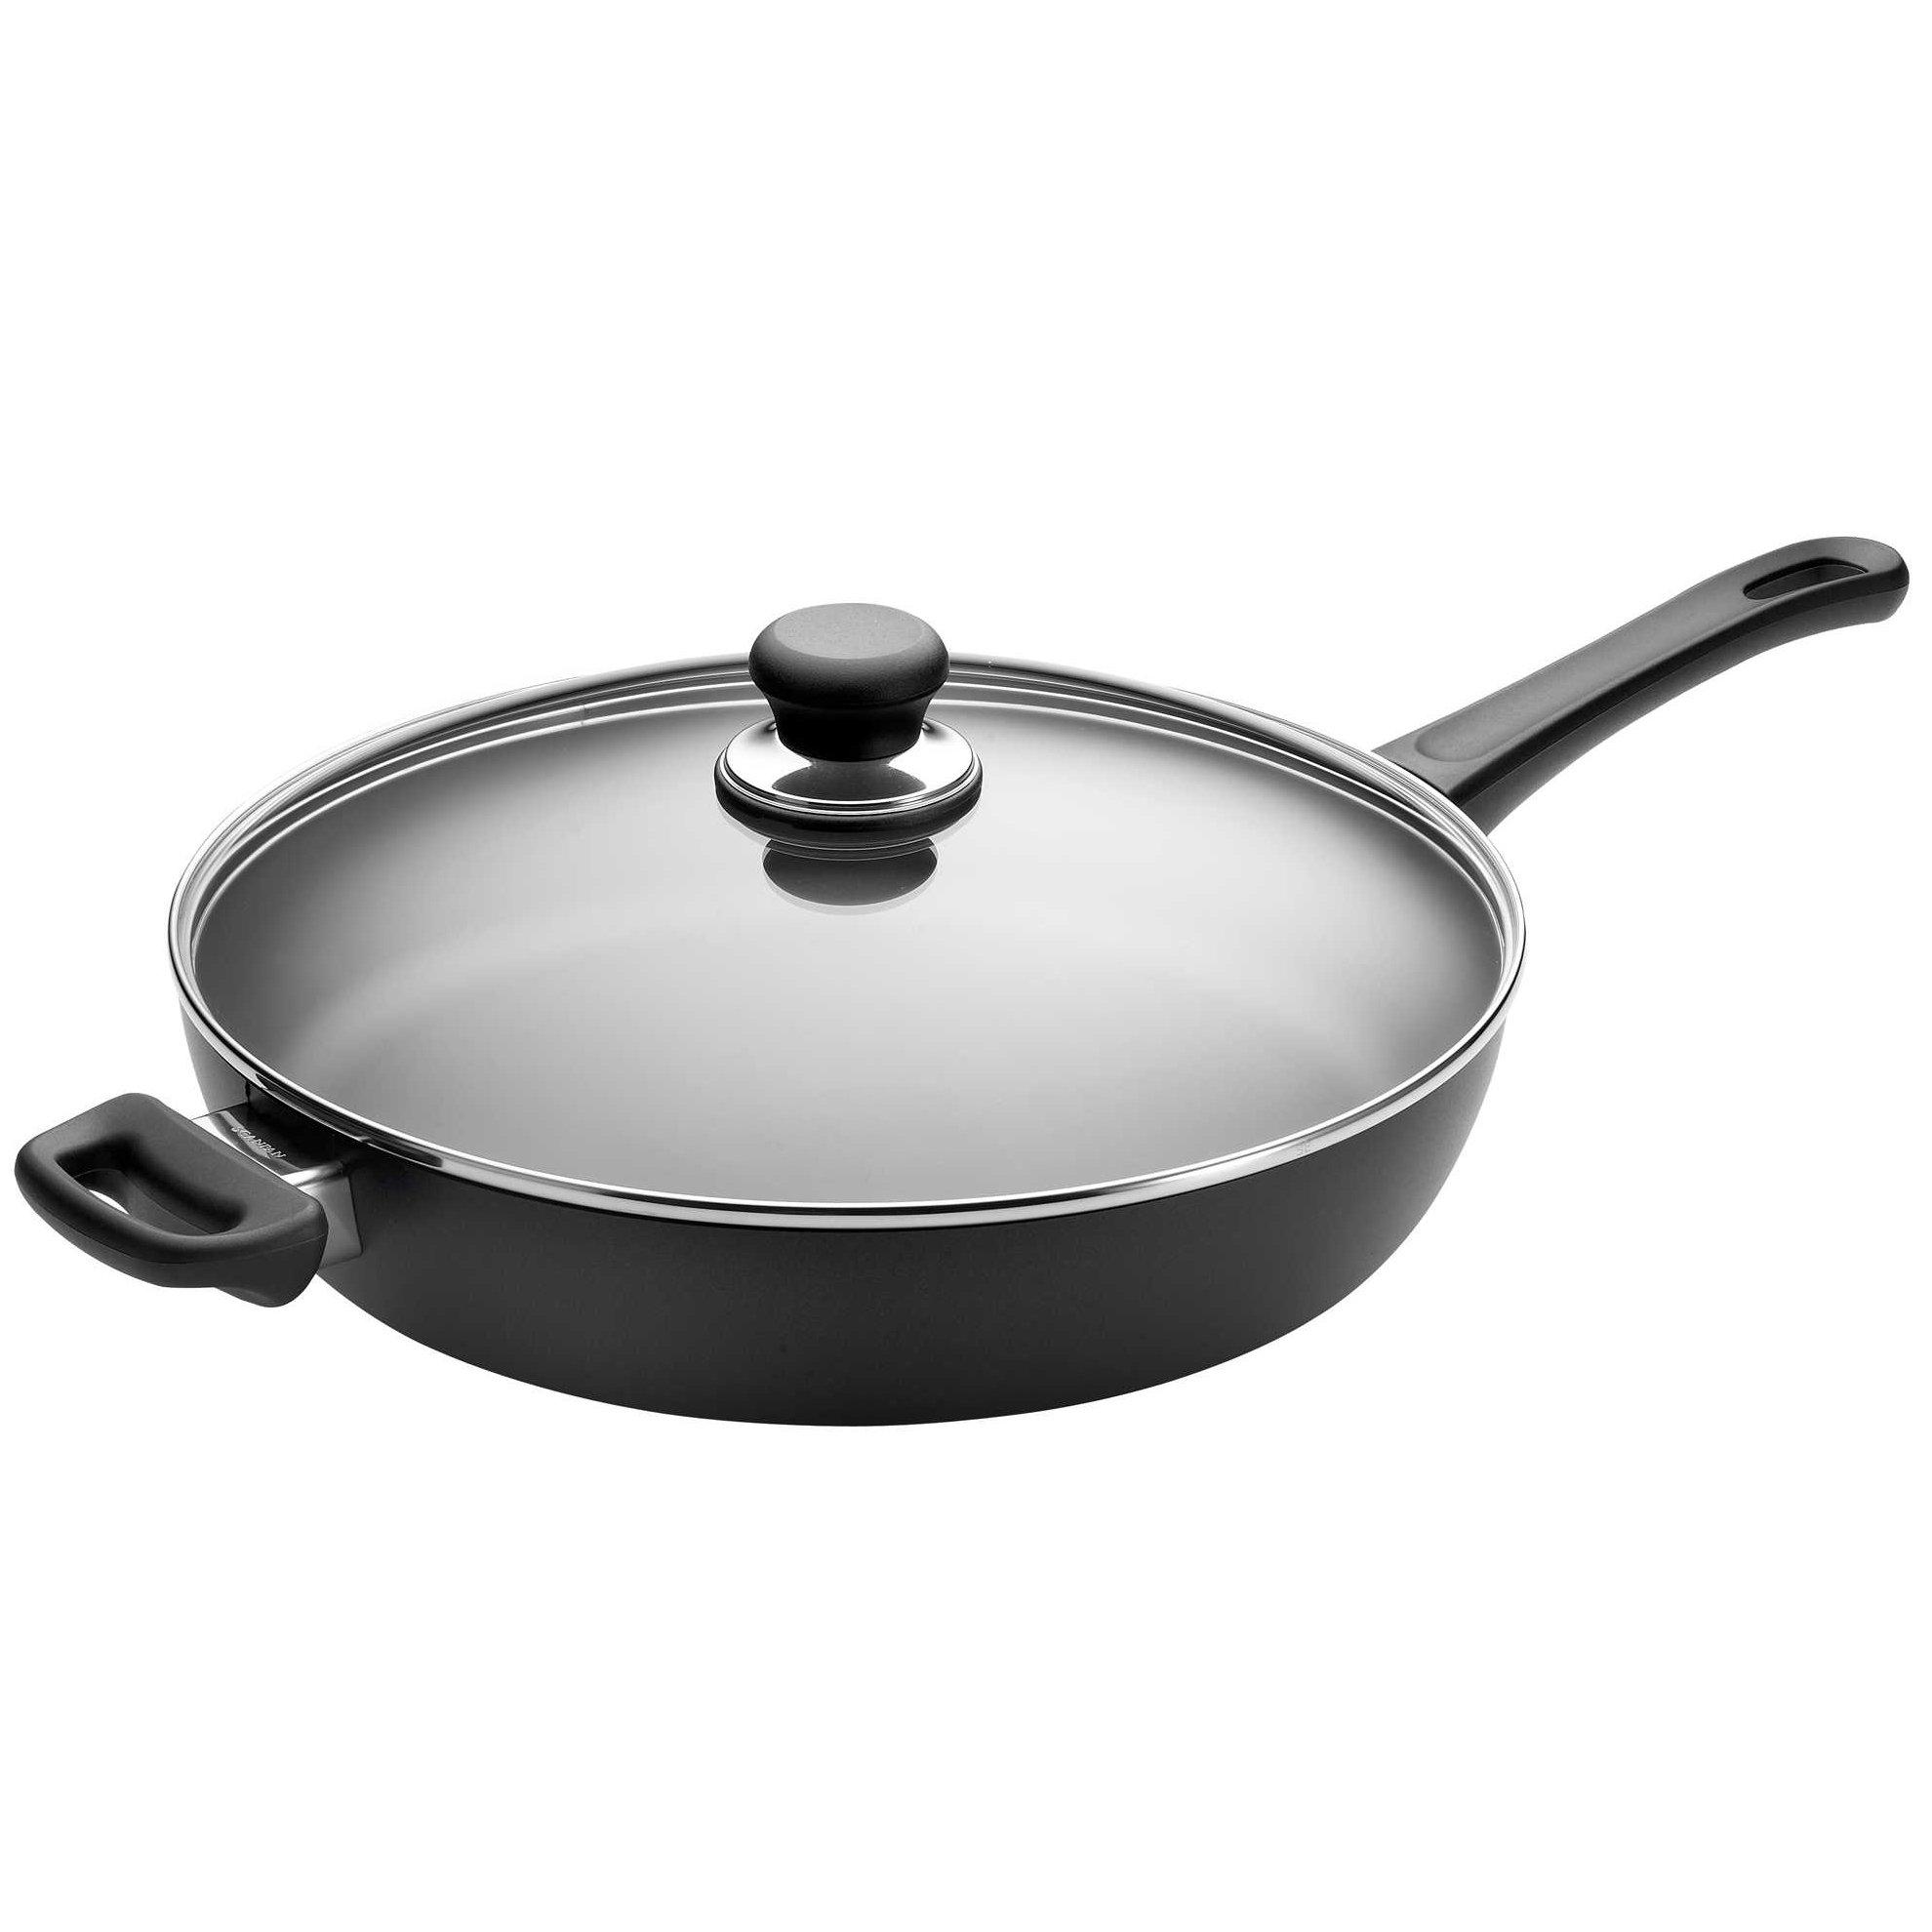 Scanpan Classic Covered Saute Pan, 12.5-Inch